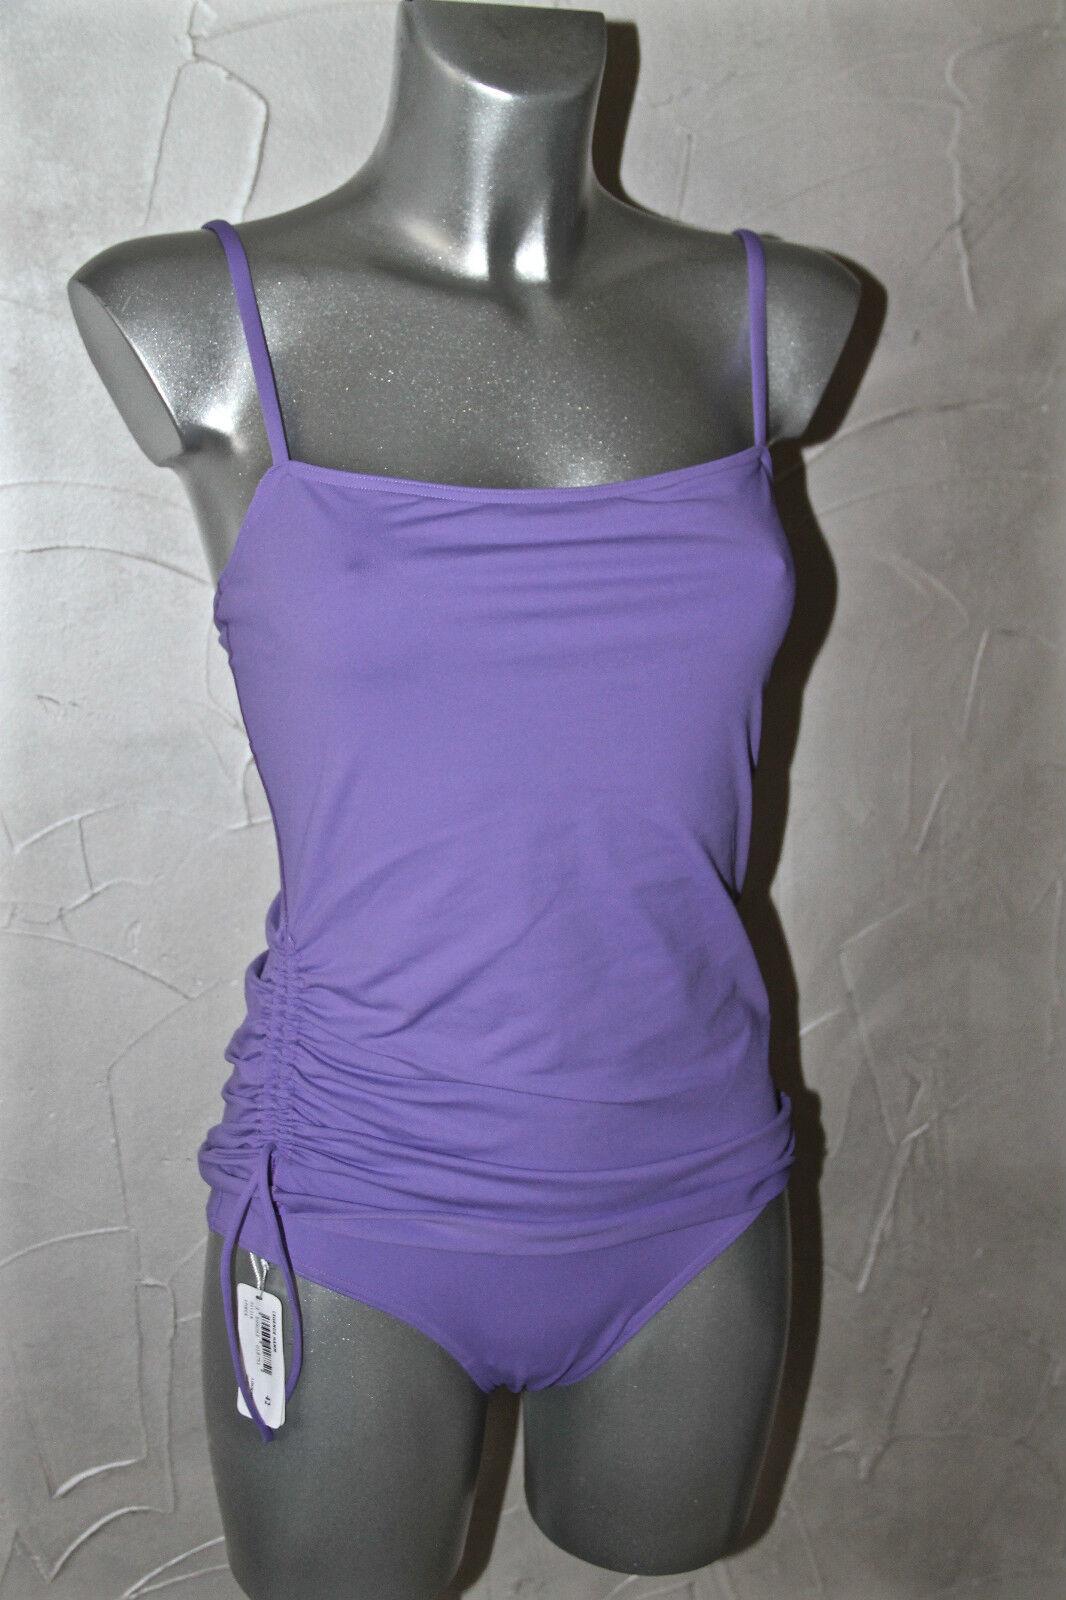 Swimsuit superimposed loukoum ERES legend hamm T 42 (US 10) NEW val